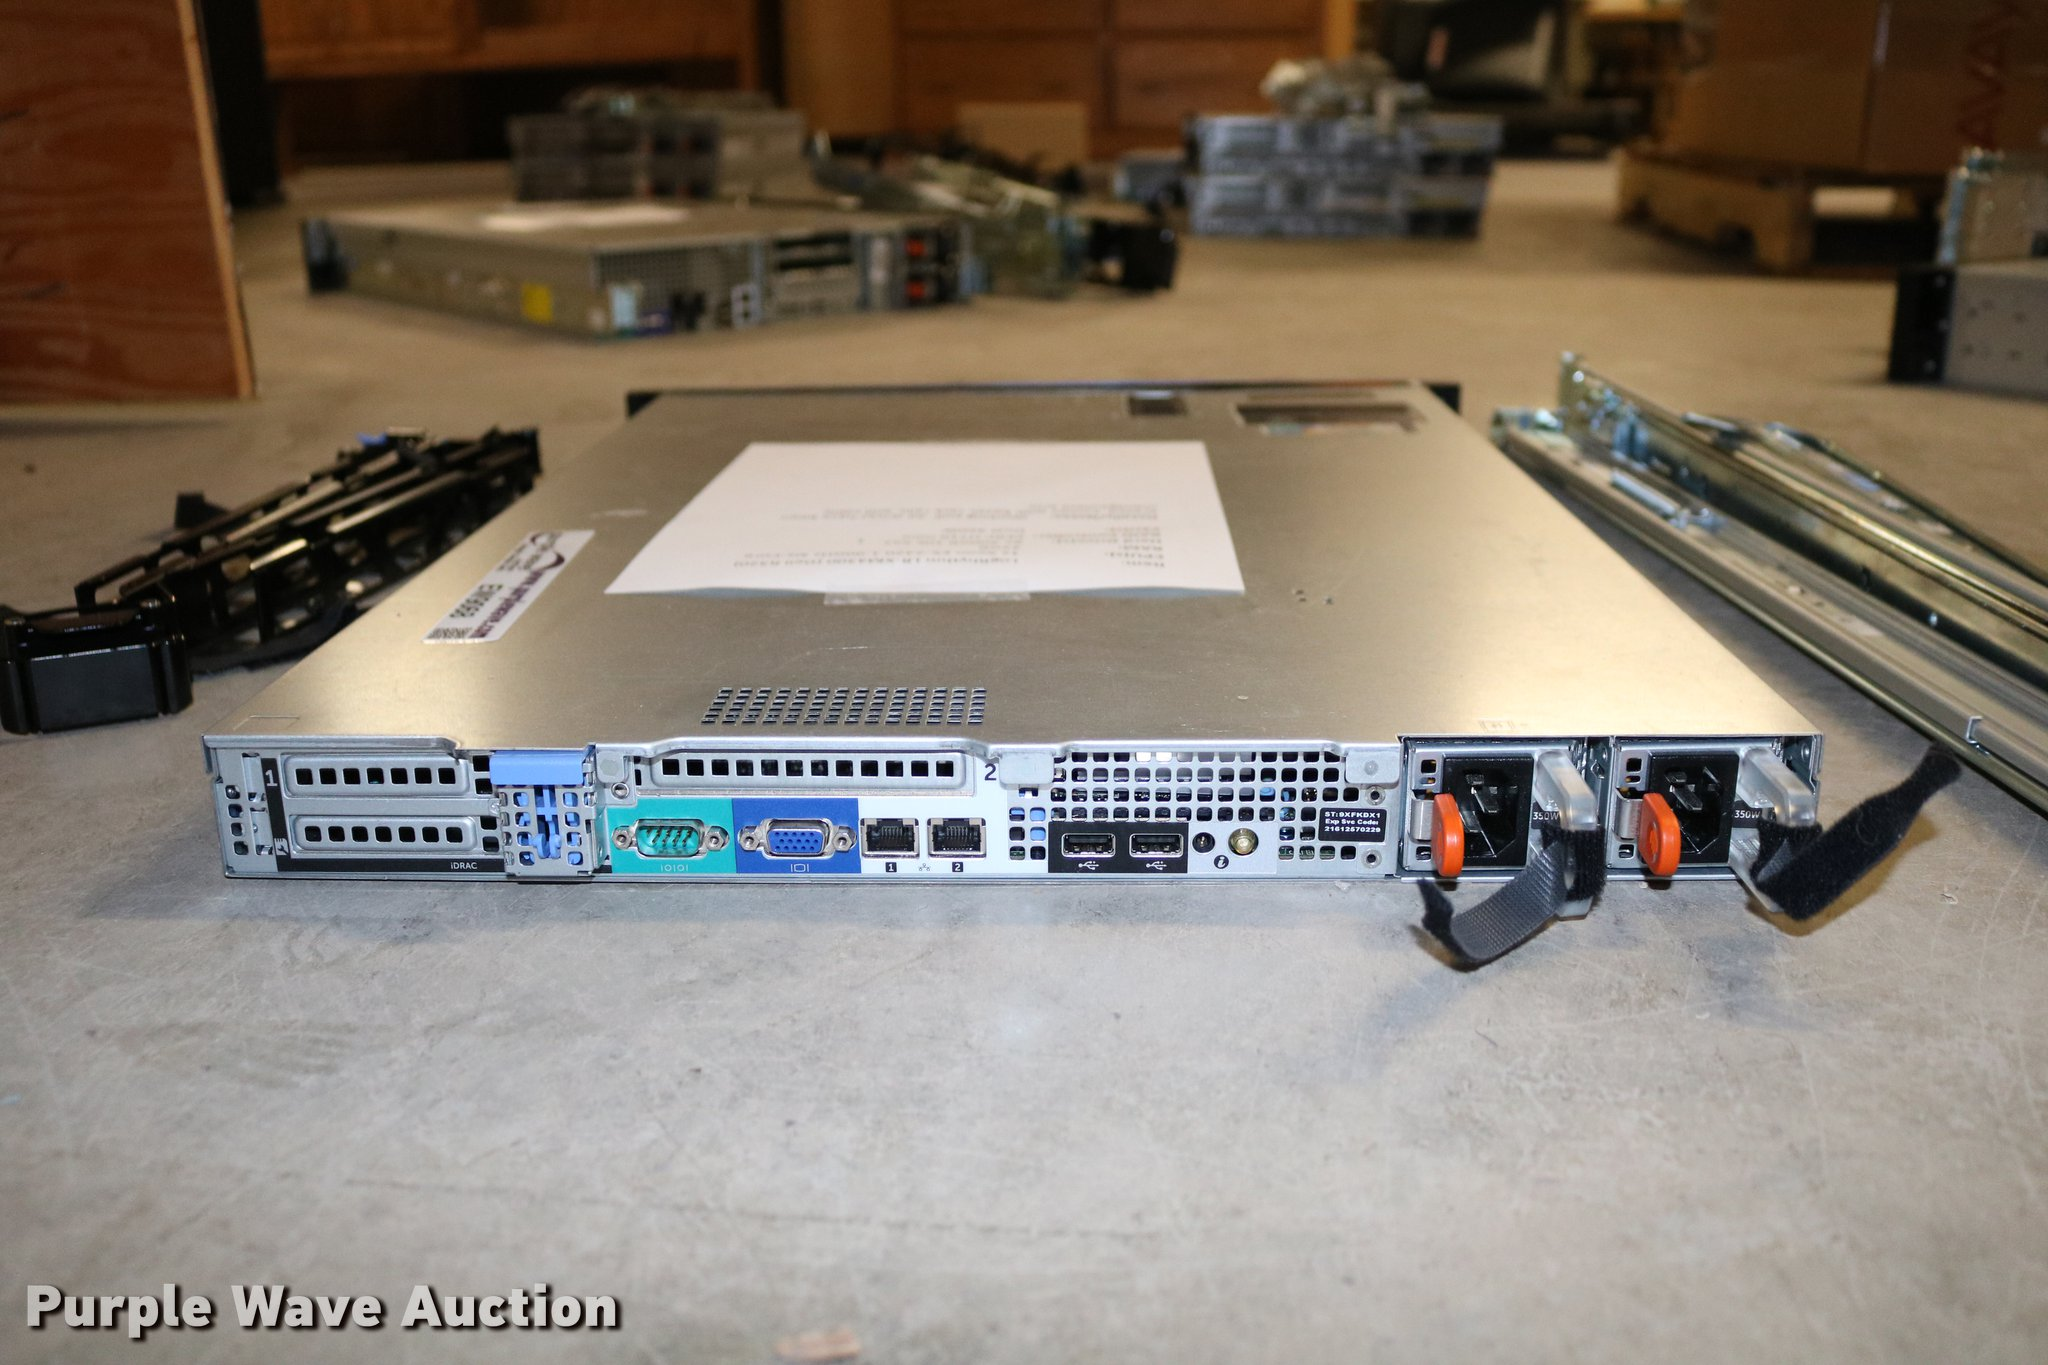 Dell R320 LogRhythm LR-XM4300 server | Item EW9068 | SOLD! M